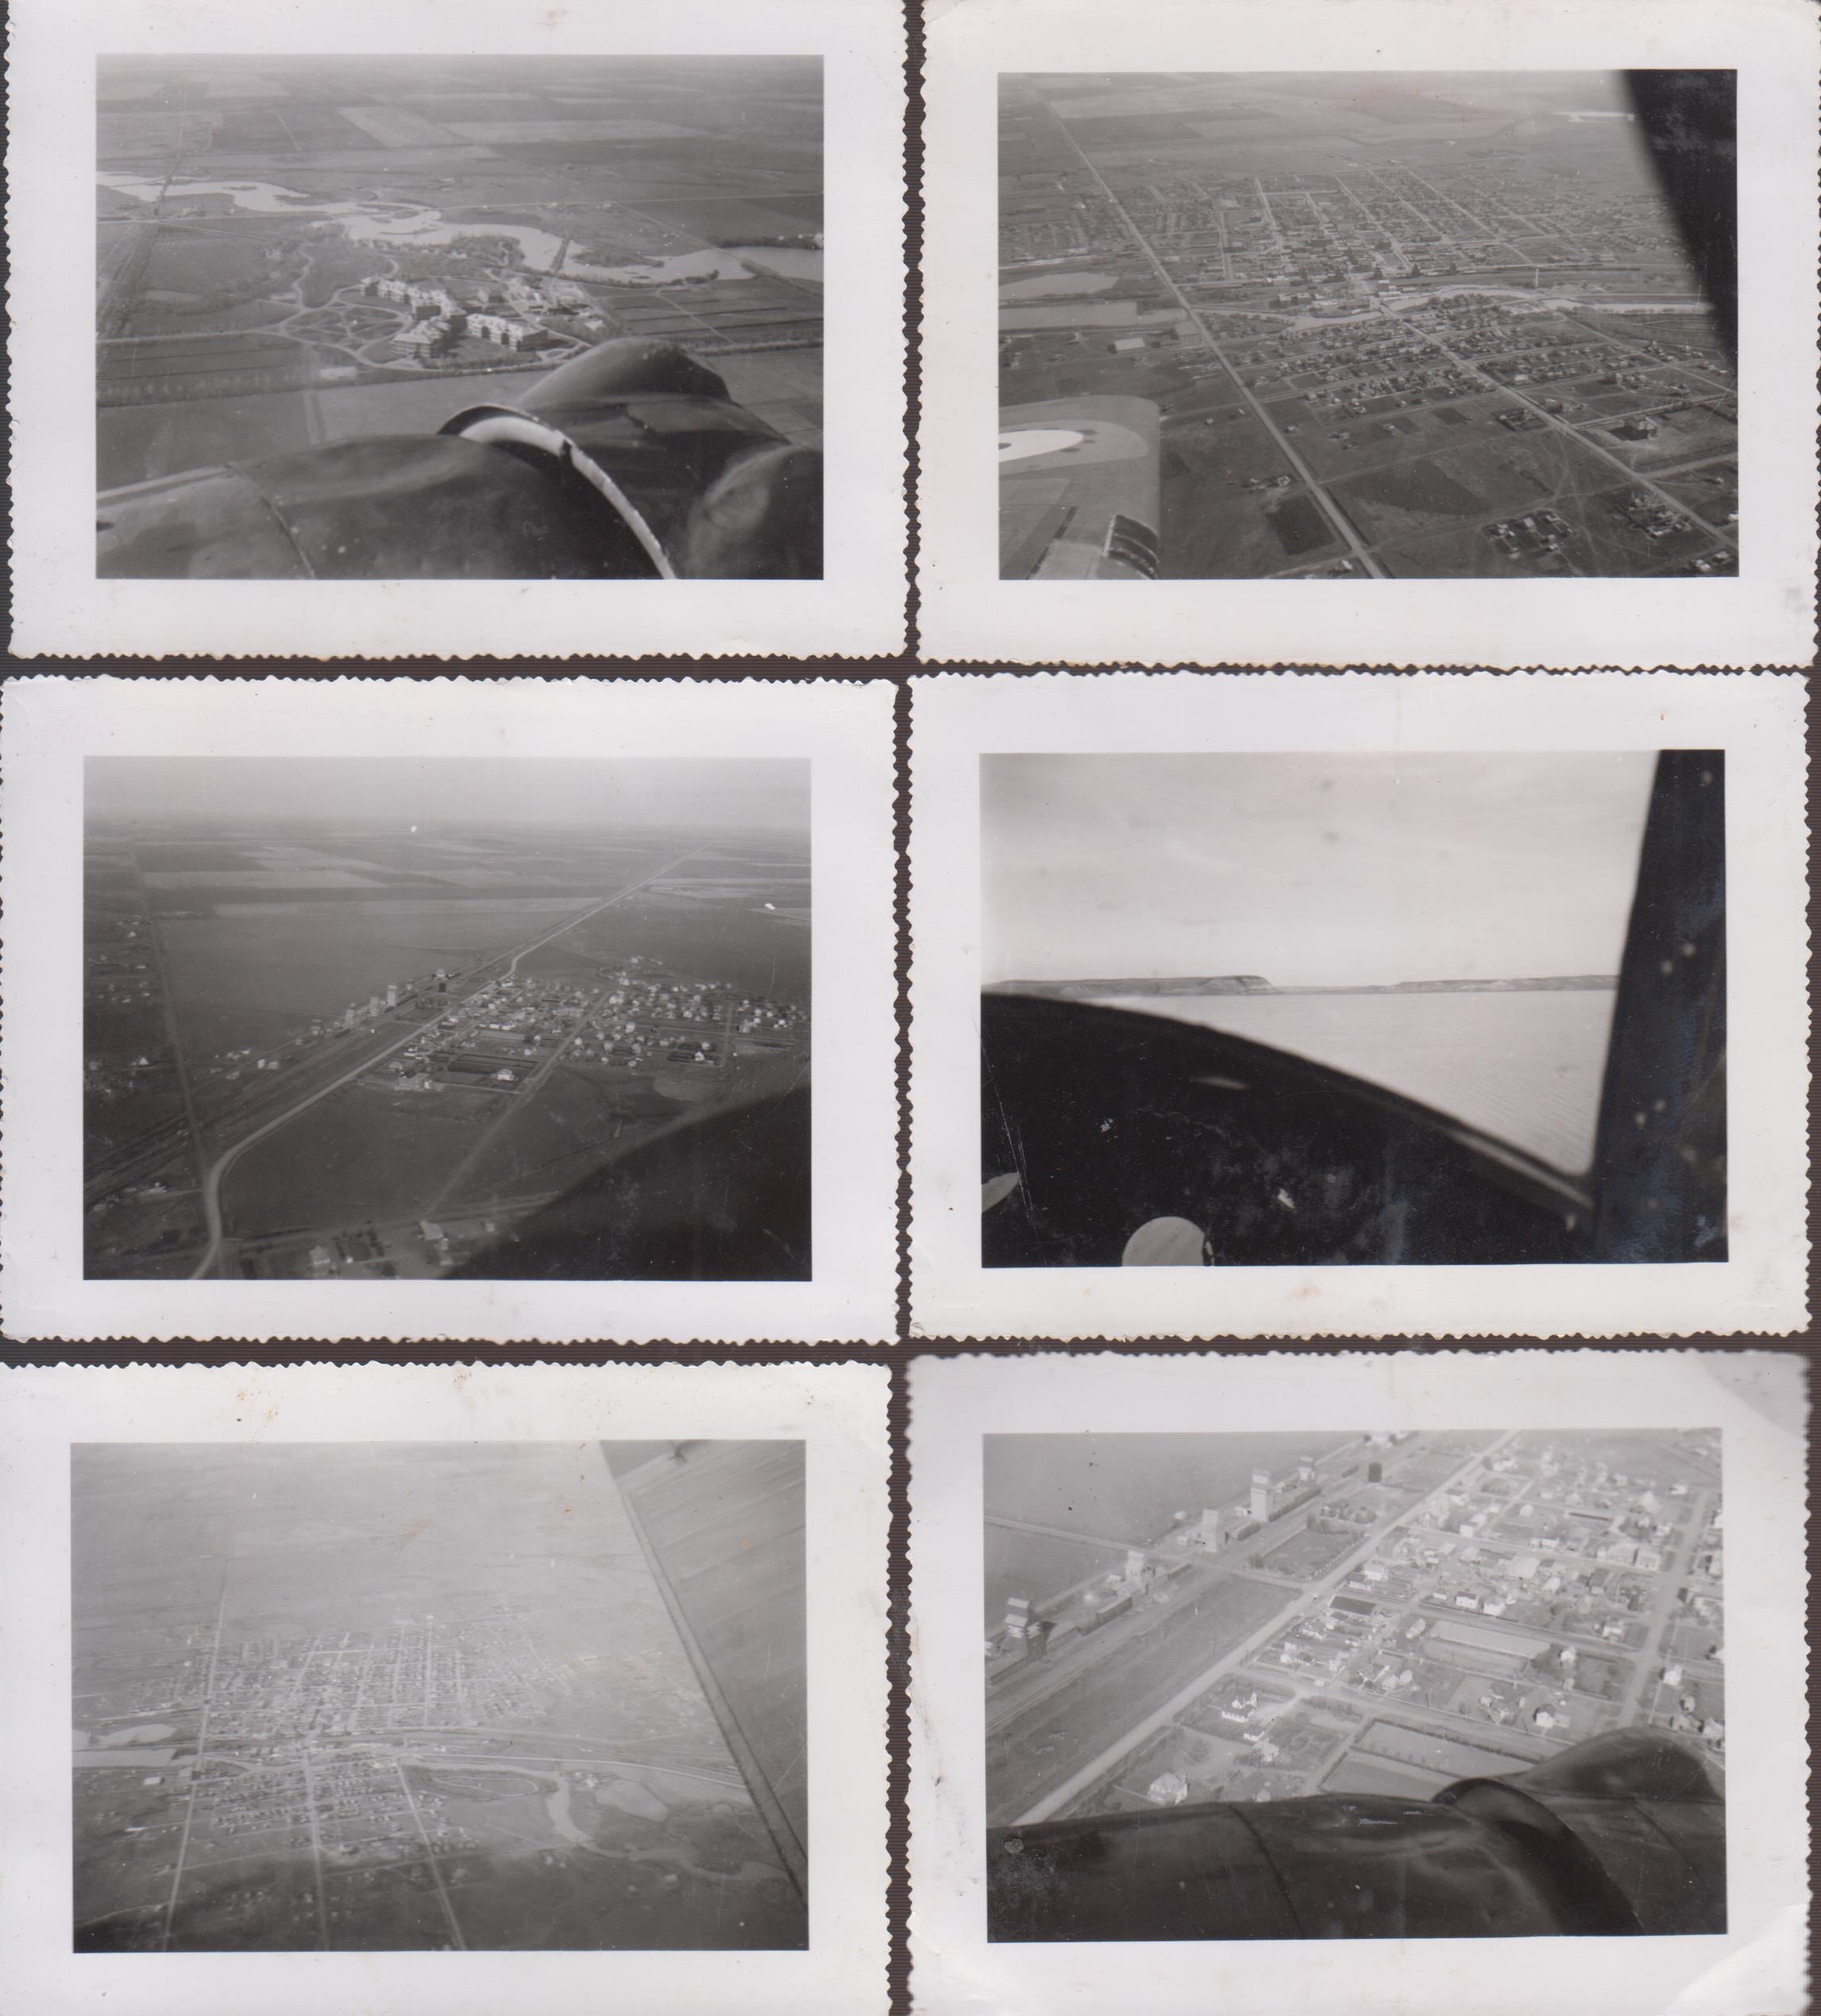 pim_weyburn_views_from_cockpit_001.jpg